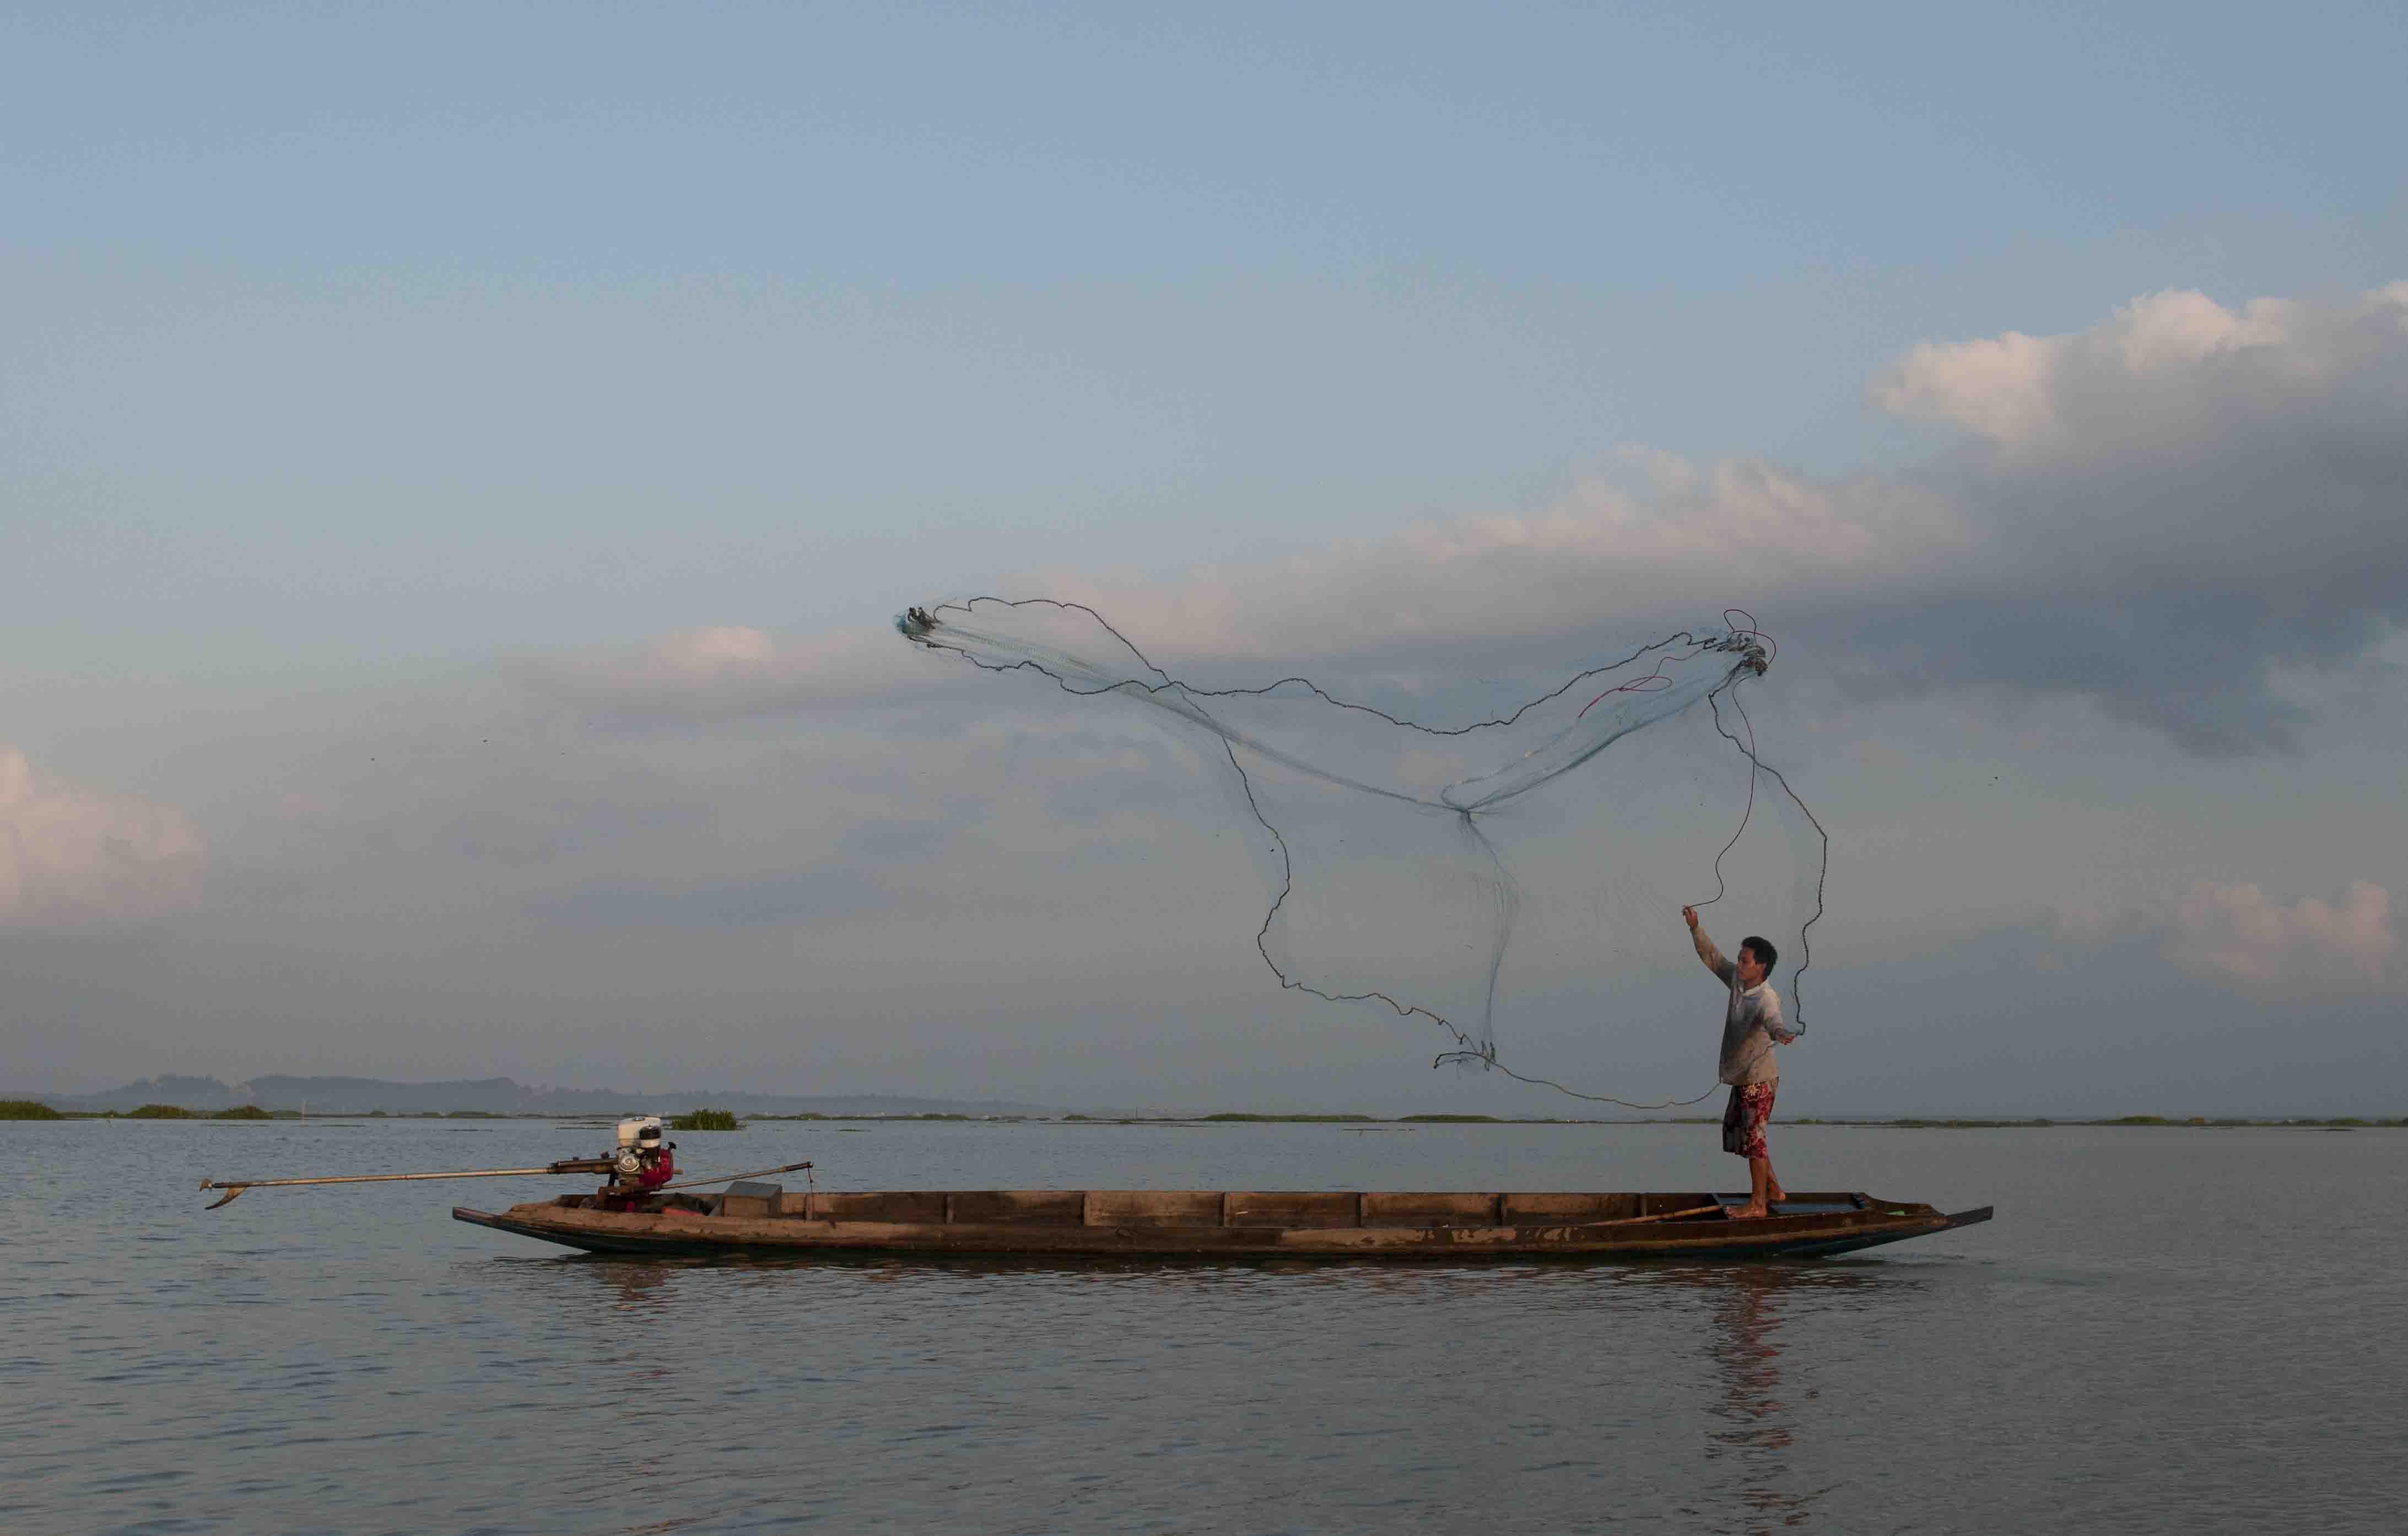 My boat, my net, my life